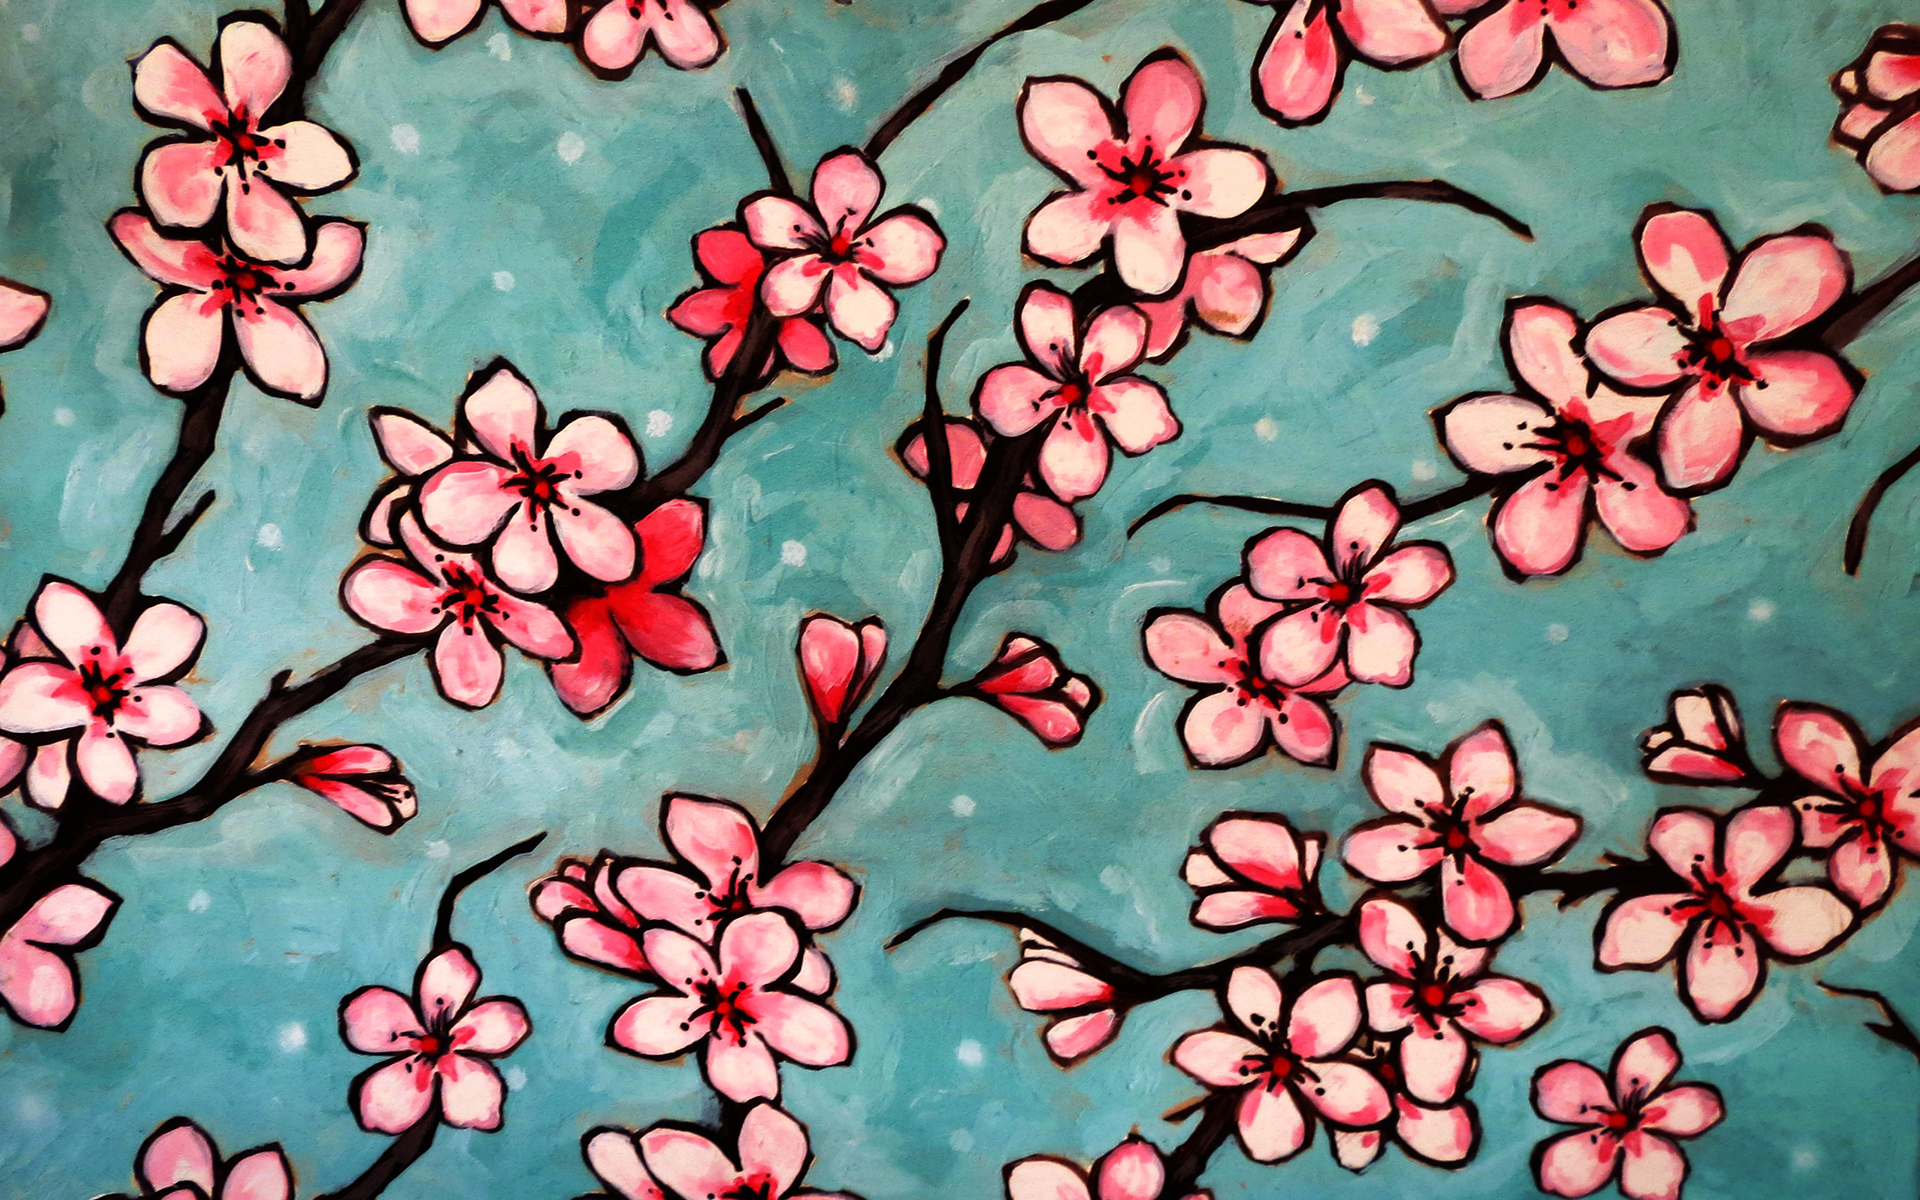 Flowers Drawing wallpaper | 1920x1200 | 97568 | WallpaperUP